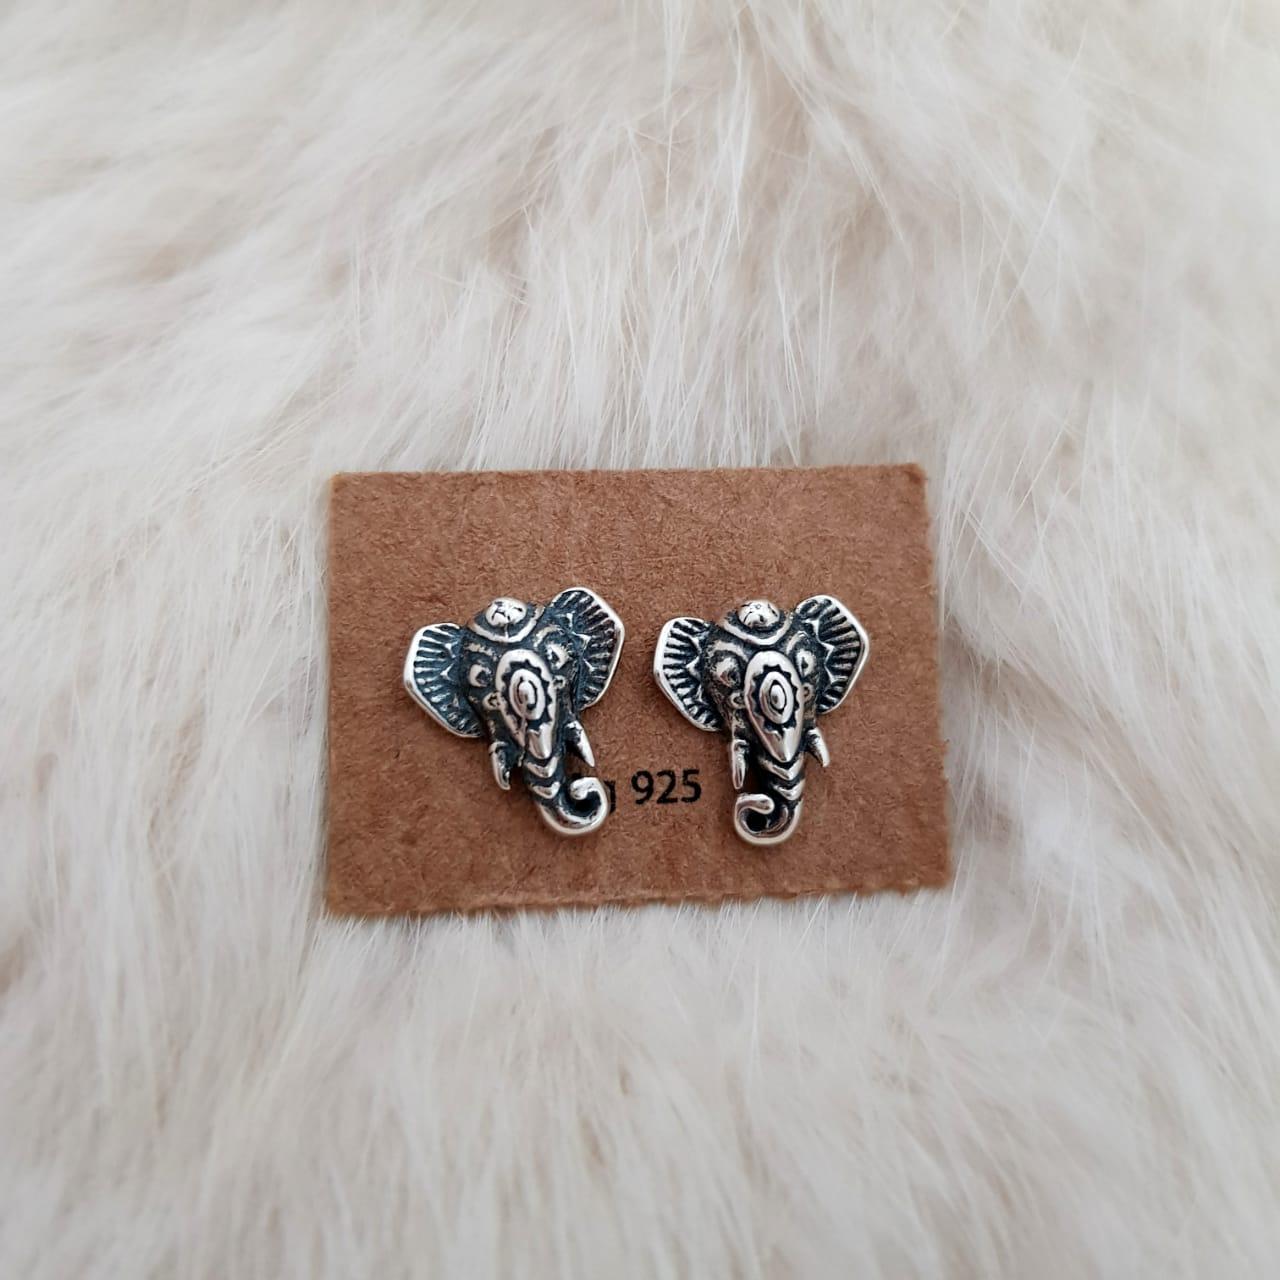 Brinco de Prata Elefante Indiano